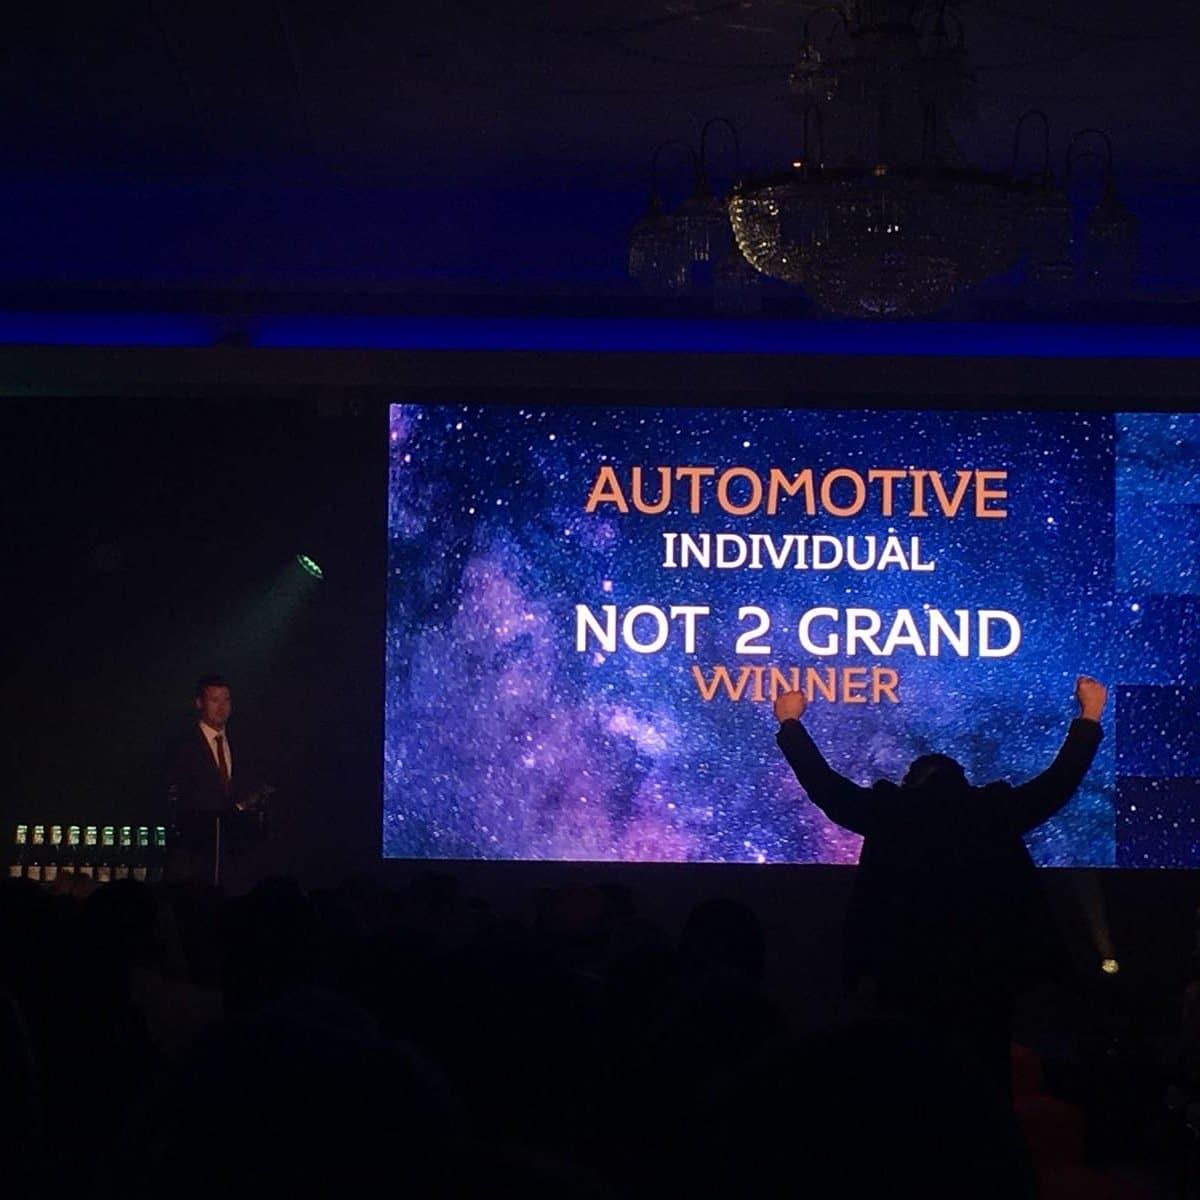 www.not2grand.co.uk, featured, UK Blog award, UK Bloggers, motoring, automotive, award-winning, car, cars, retro car, classic car, the big lebowski